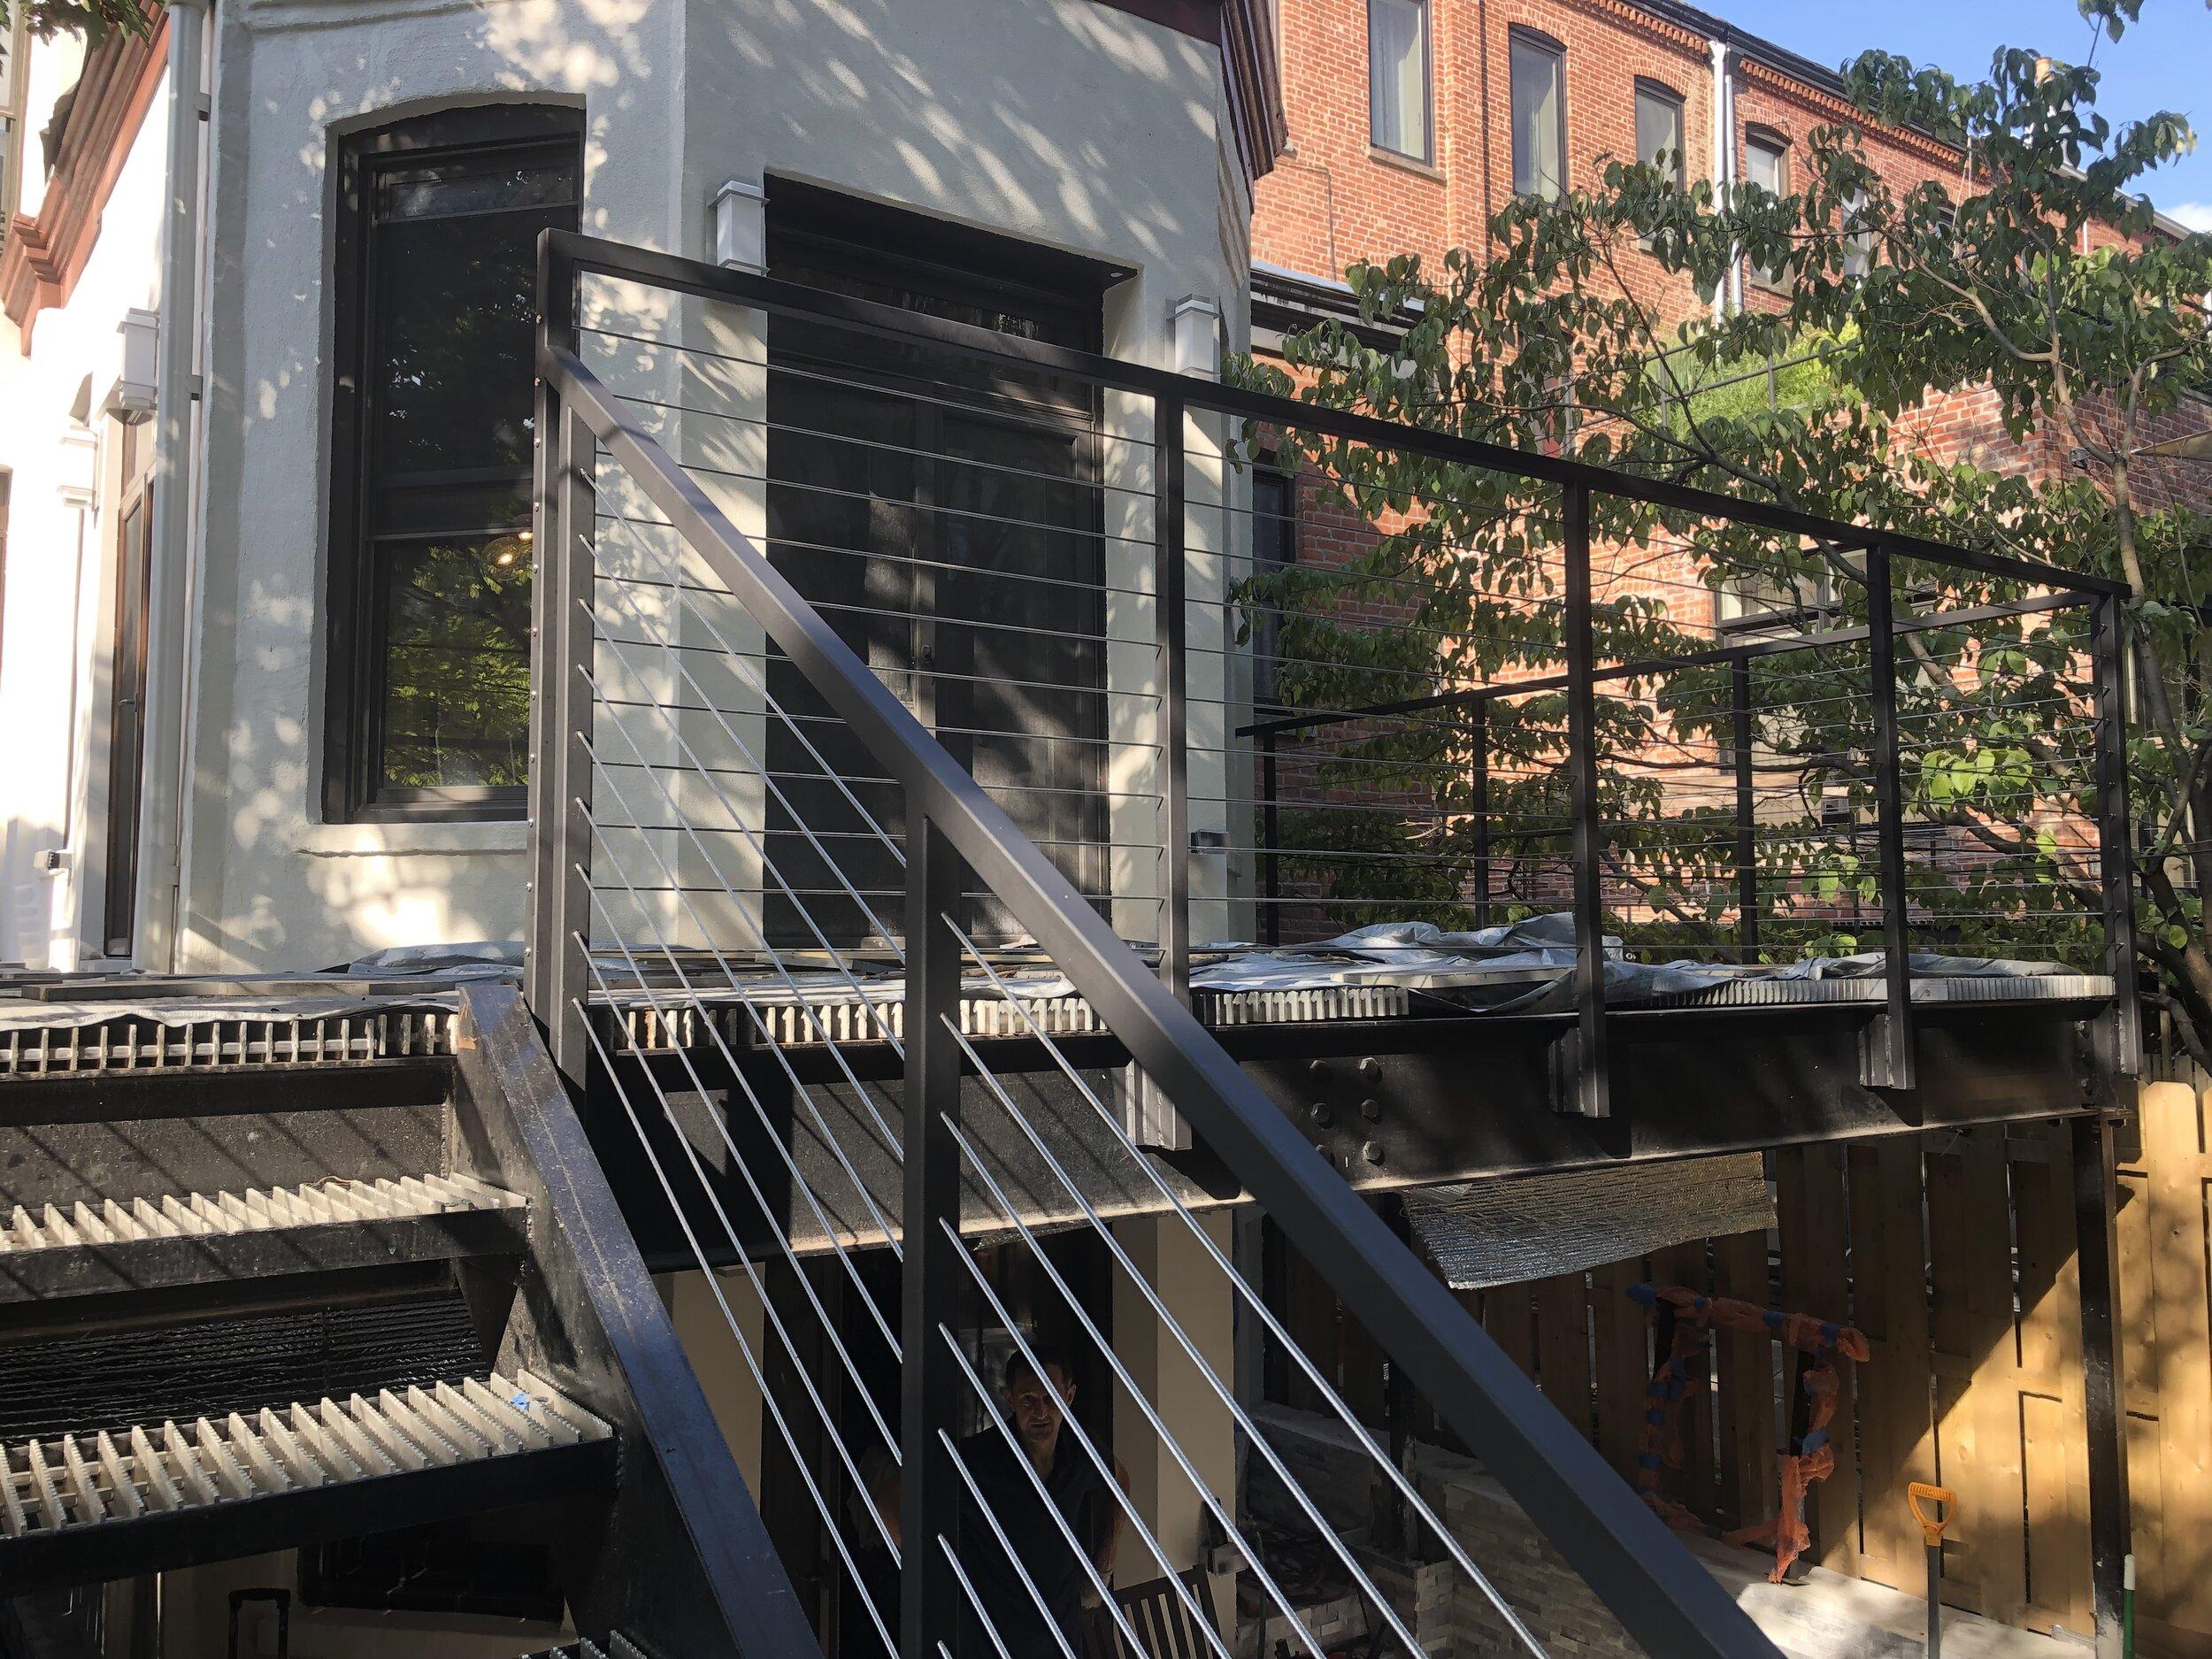 Park Slope Brownstone, Cable black stainless steel railings